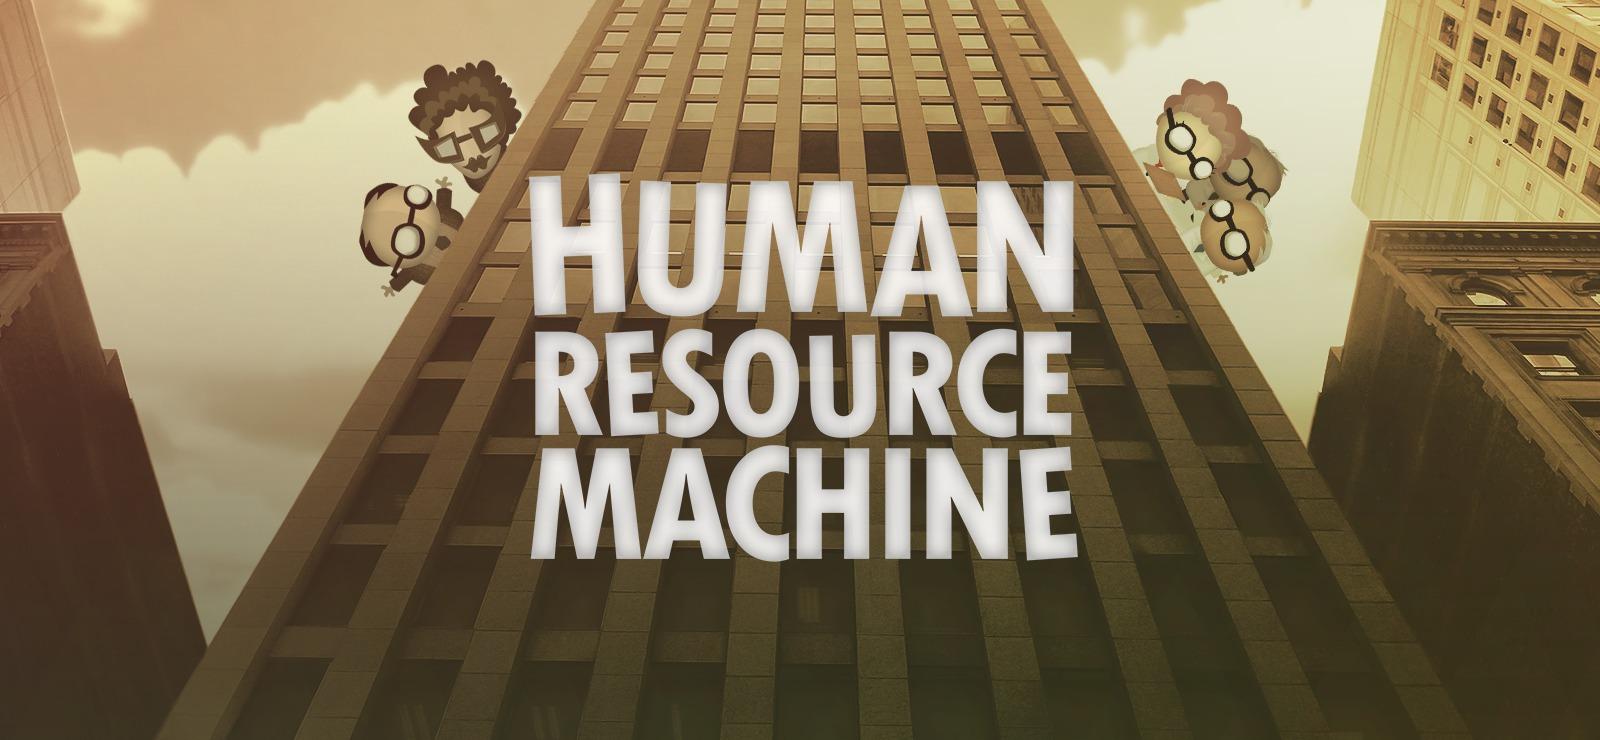 human-resource-machine-3